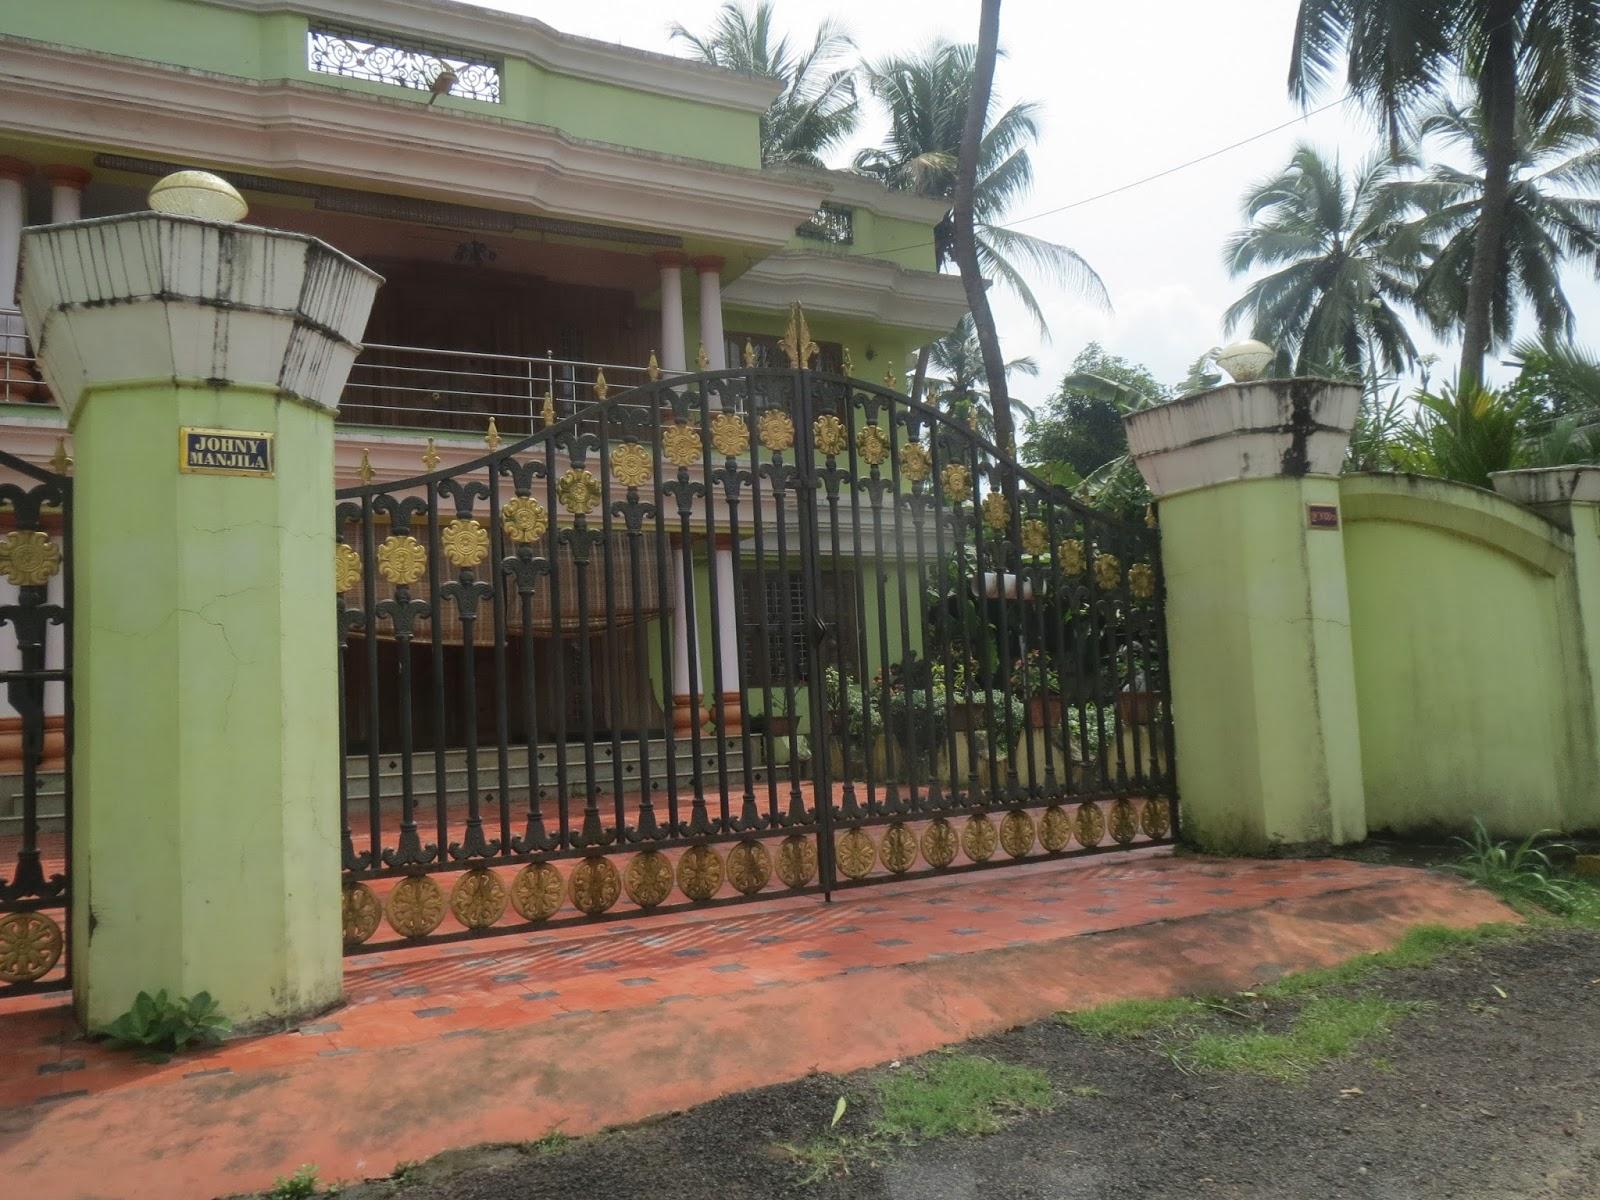 Kerala Gate Designs: House gates in Kerala, India